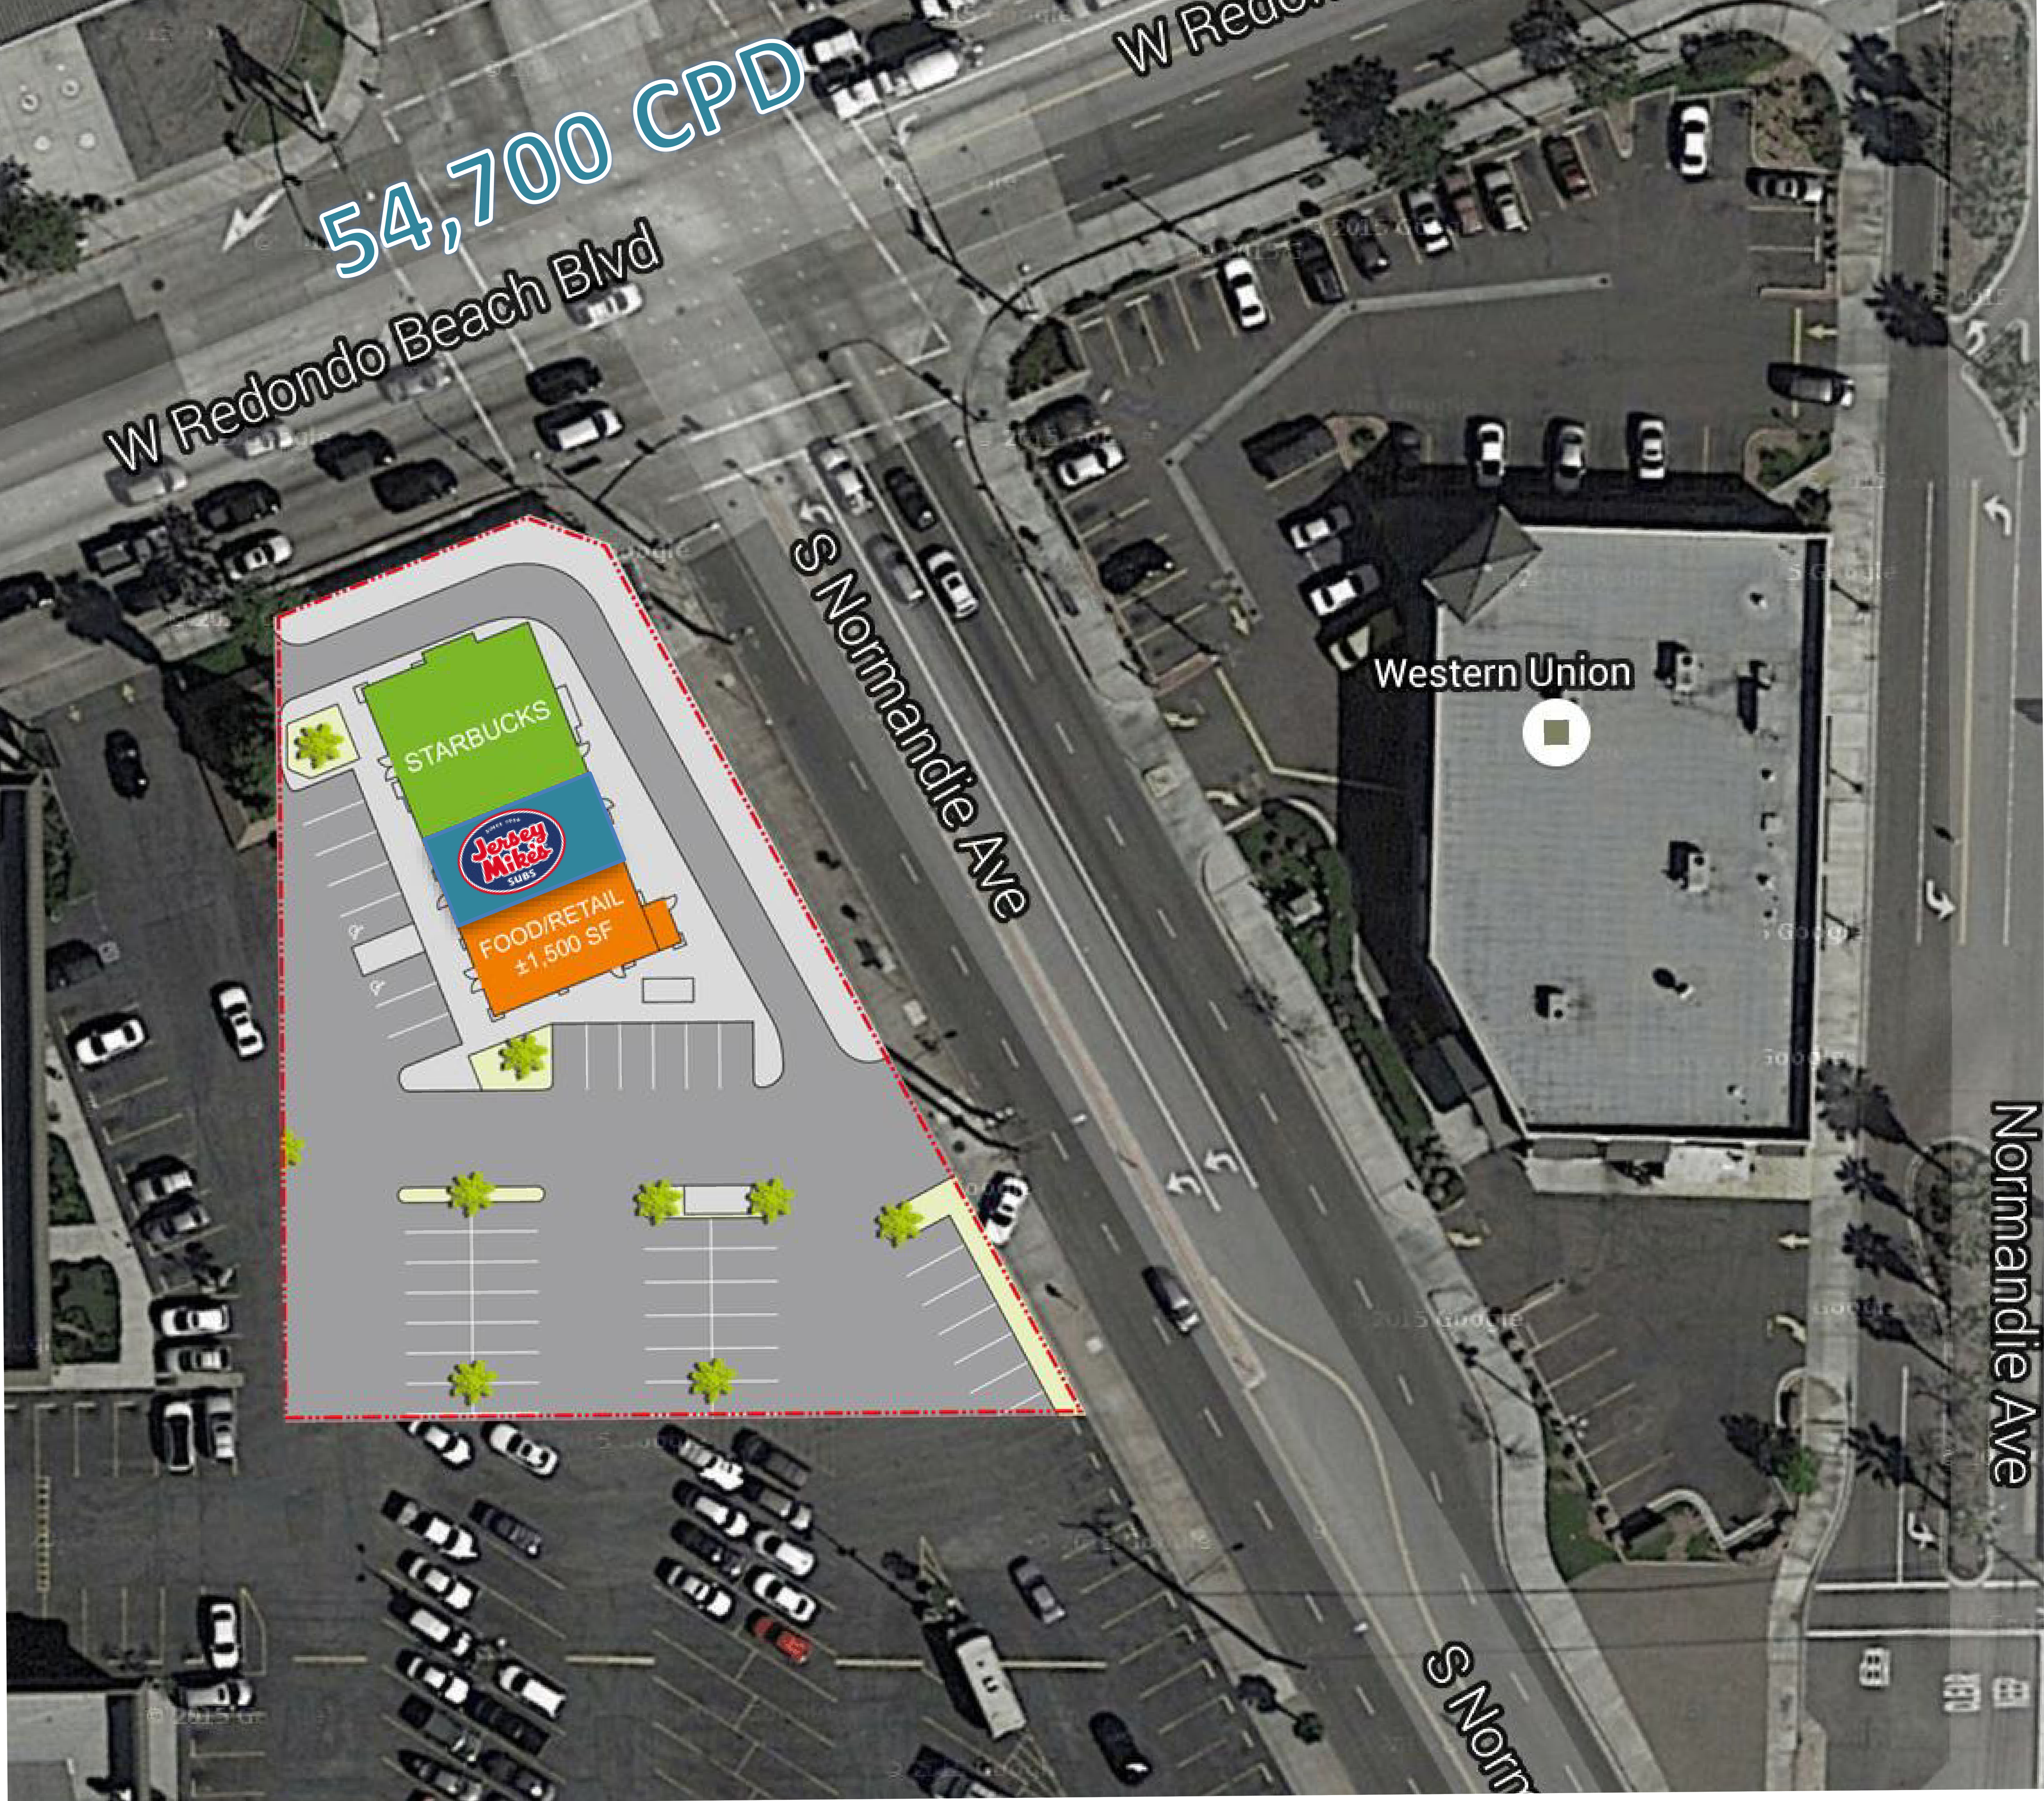 SWC Redondo Beach Blvd & Normandie: site plan